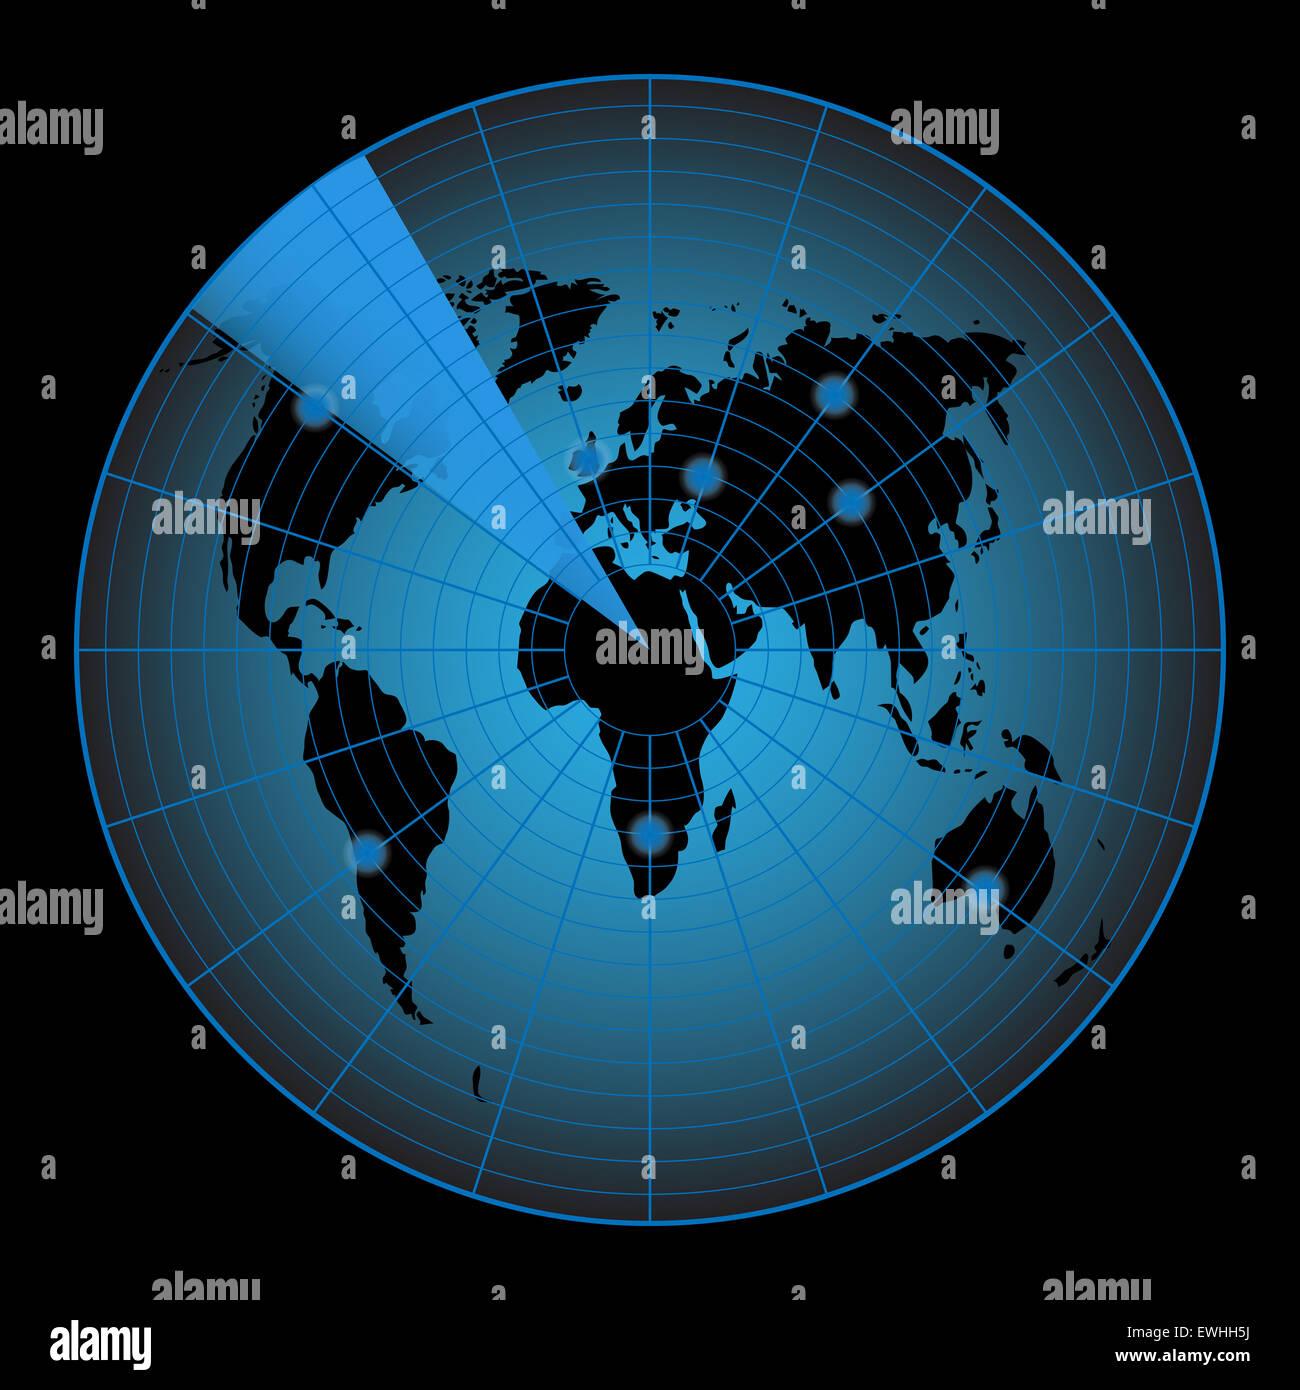 World Map Target on